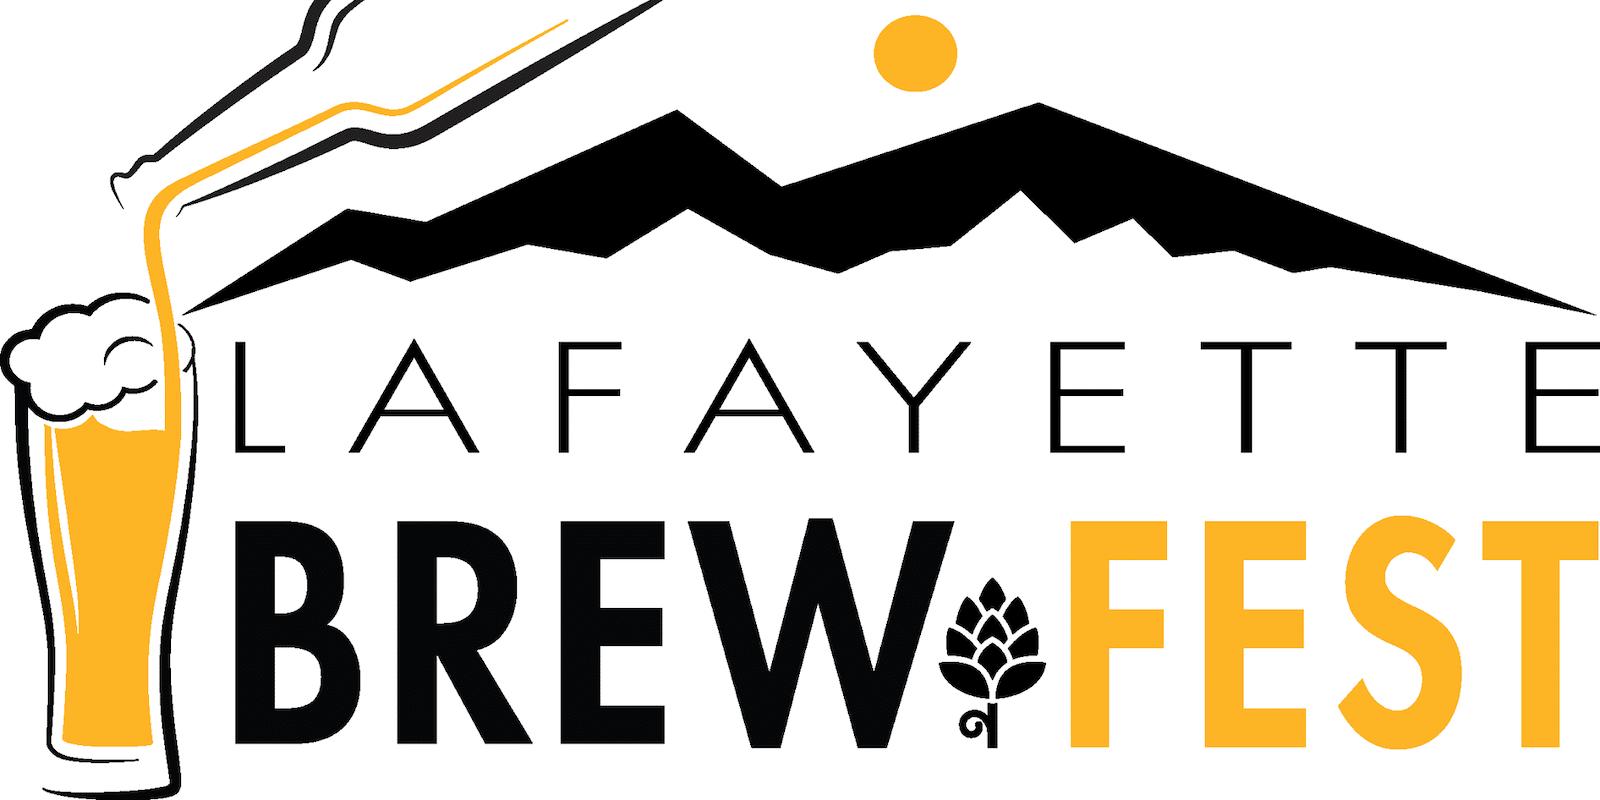 Image of the Lafayette Brew Fest logo